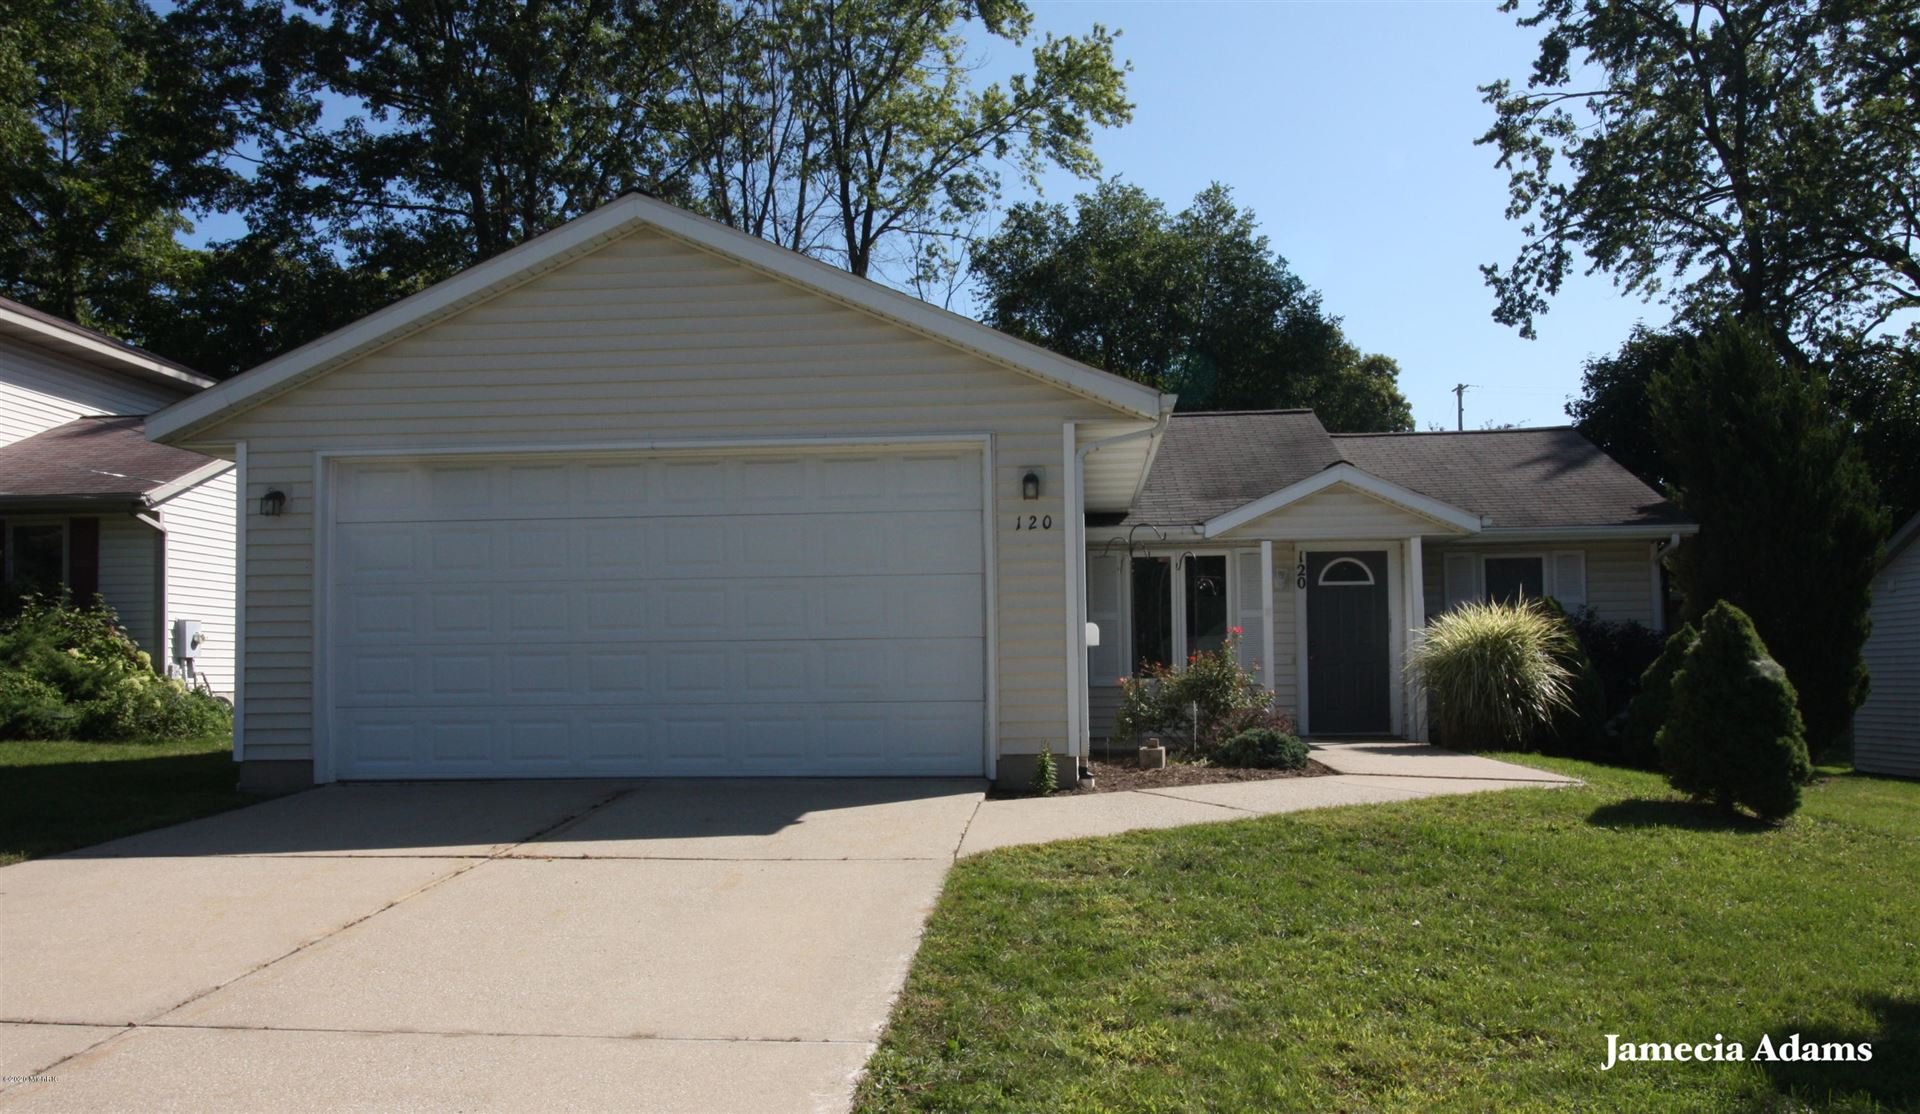 120 Alten Avenue NE, Grand Rapids, MI 49503 - MLS#: 20037844